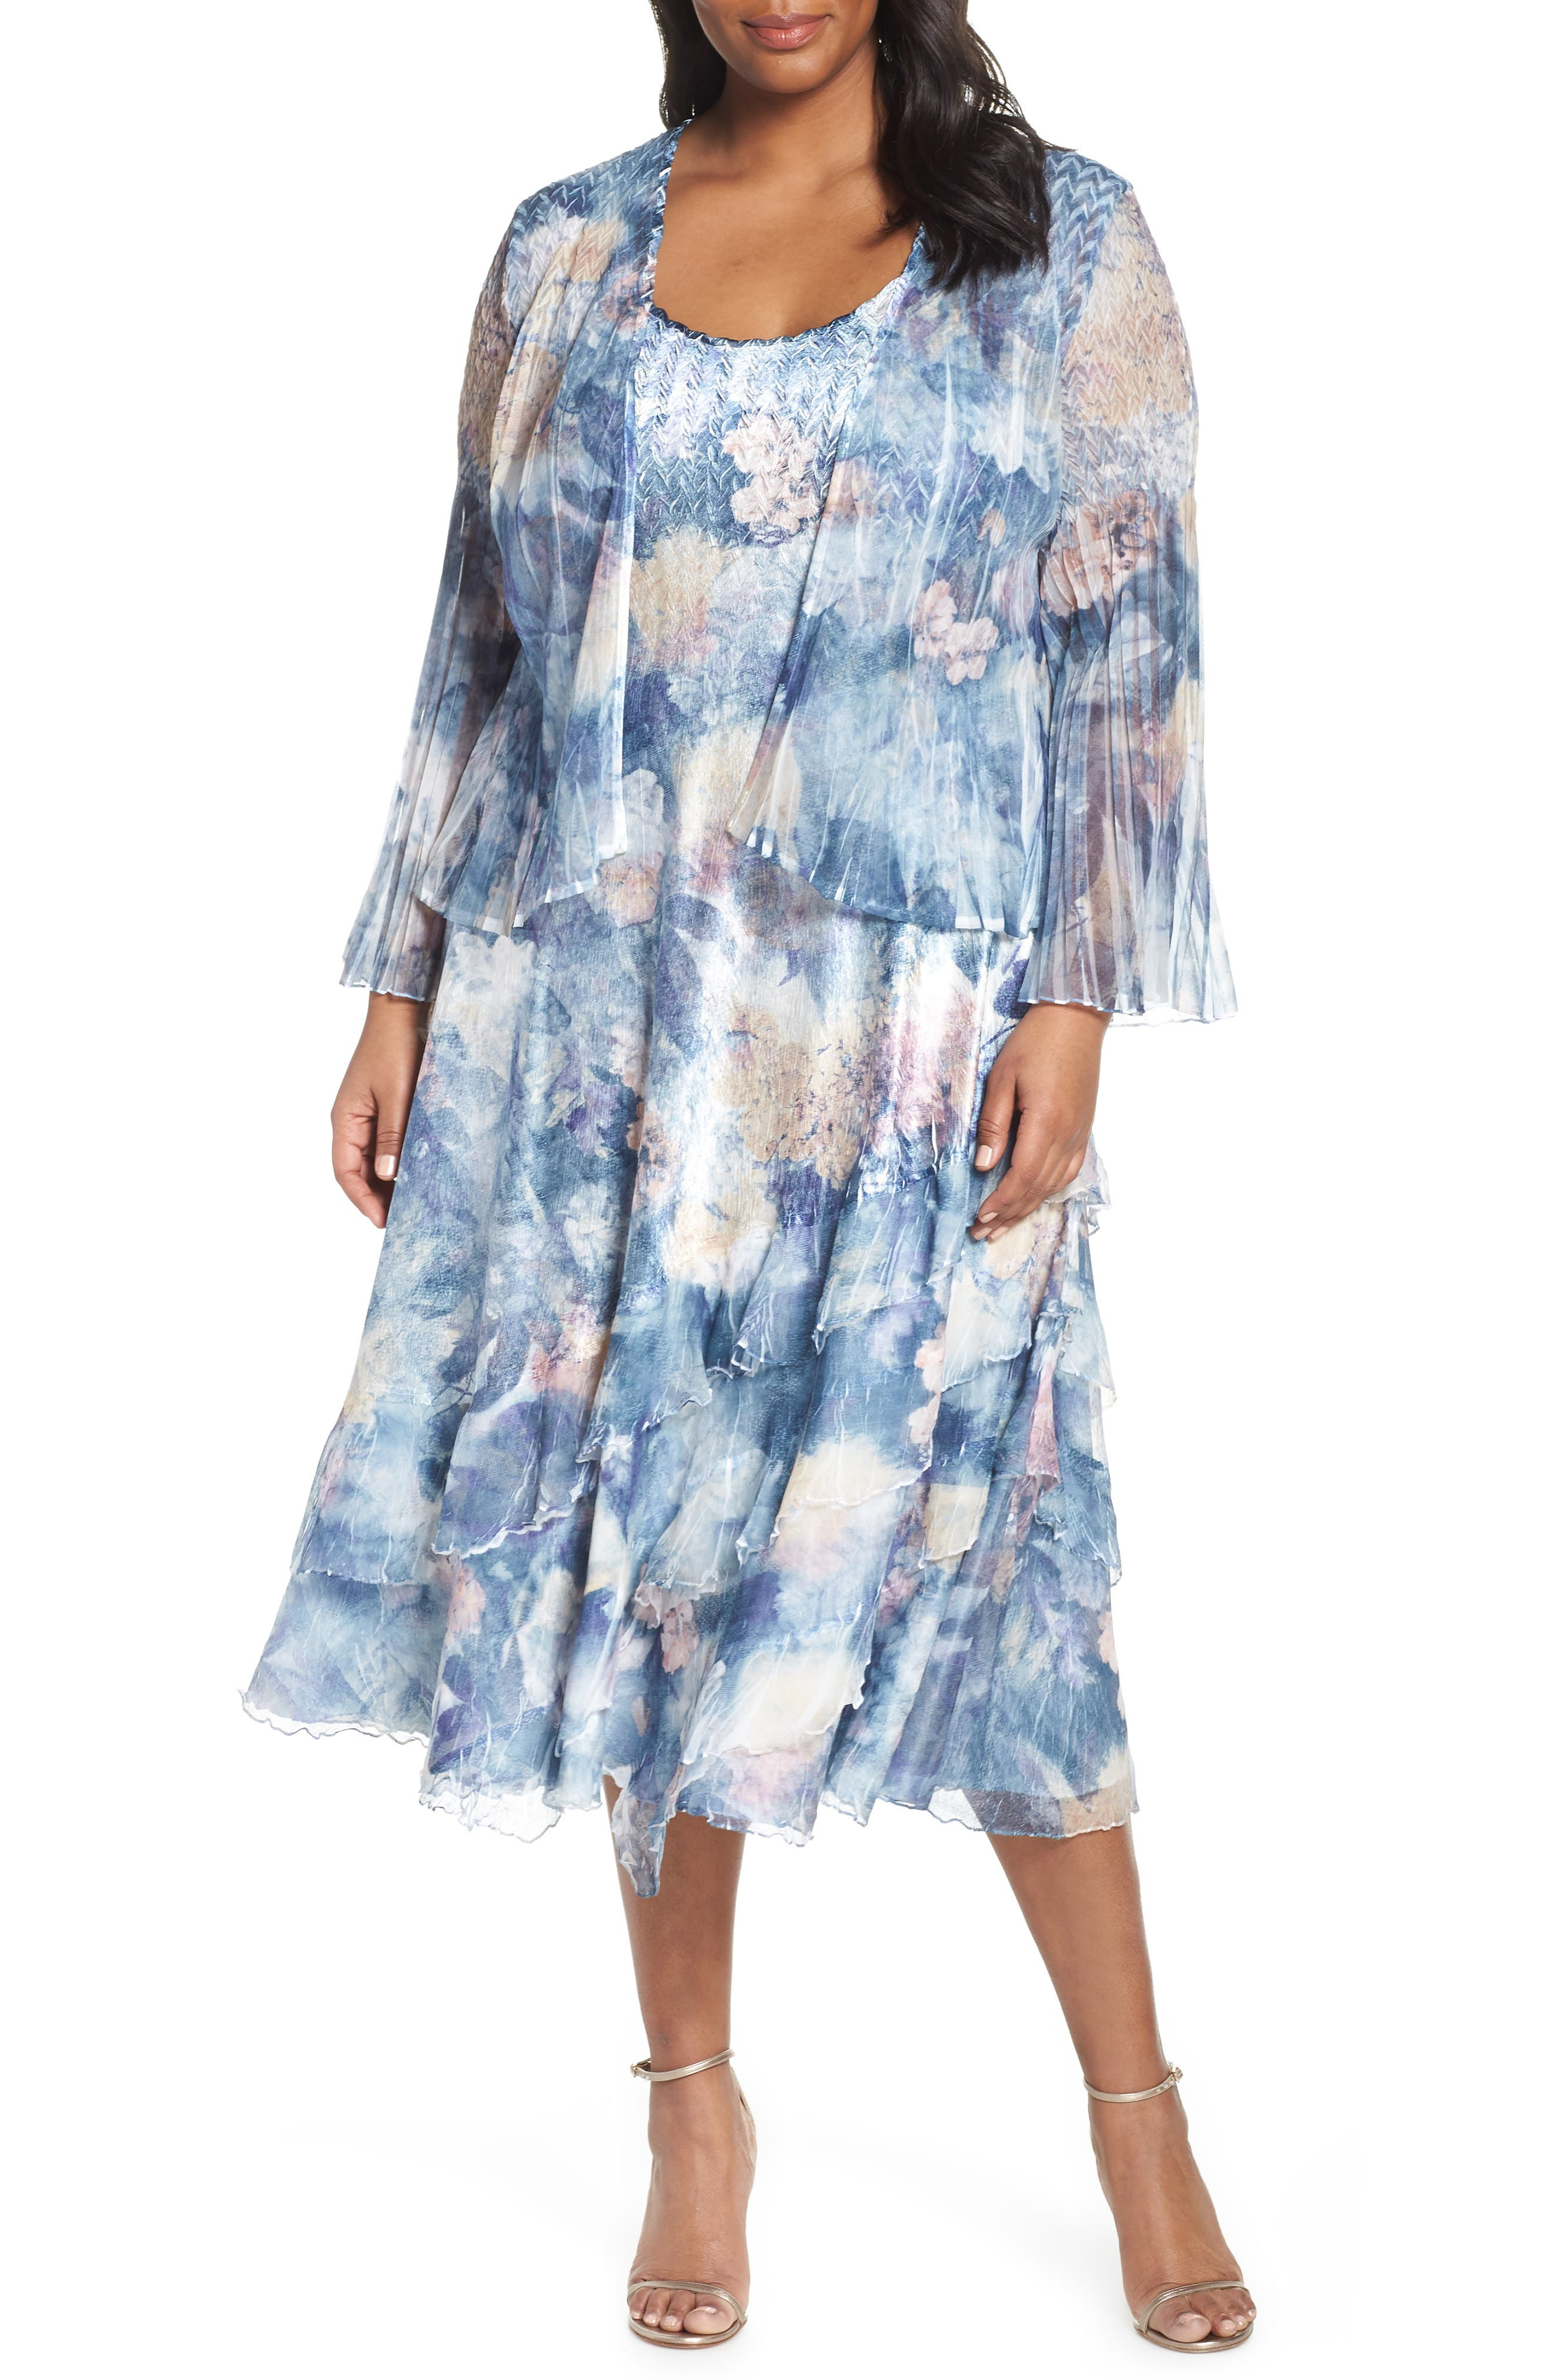 Plus Size Vintage Dresses, Plus Size Retro Dresses Plus Size Womens Komarov Floral Print Midi Dress  Jacket $280.80 AT vintagedancer.com